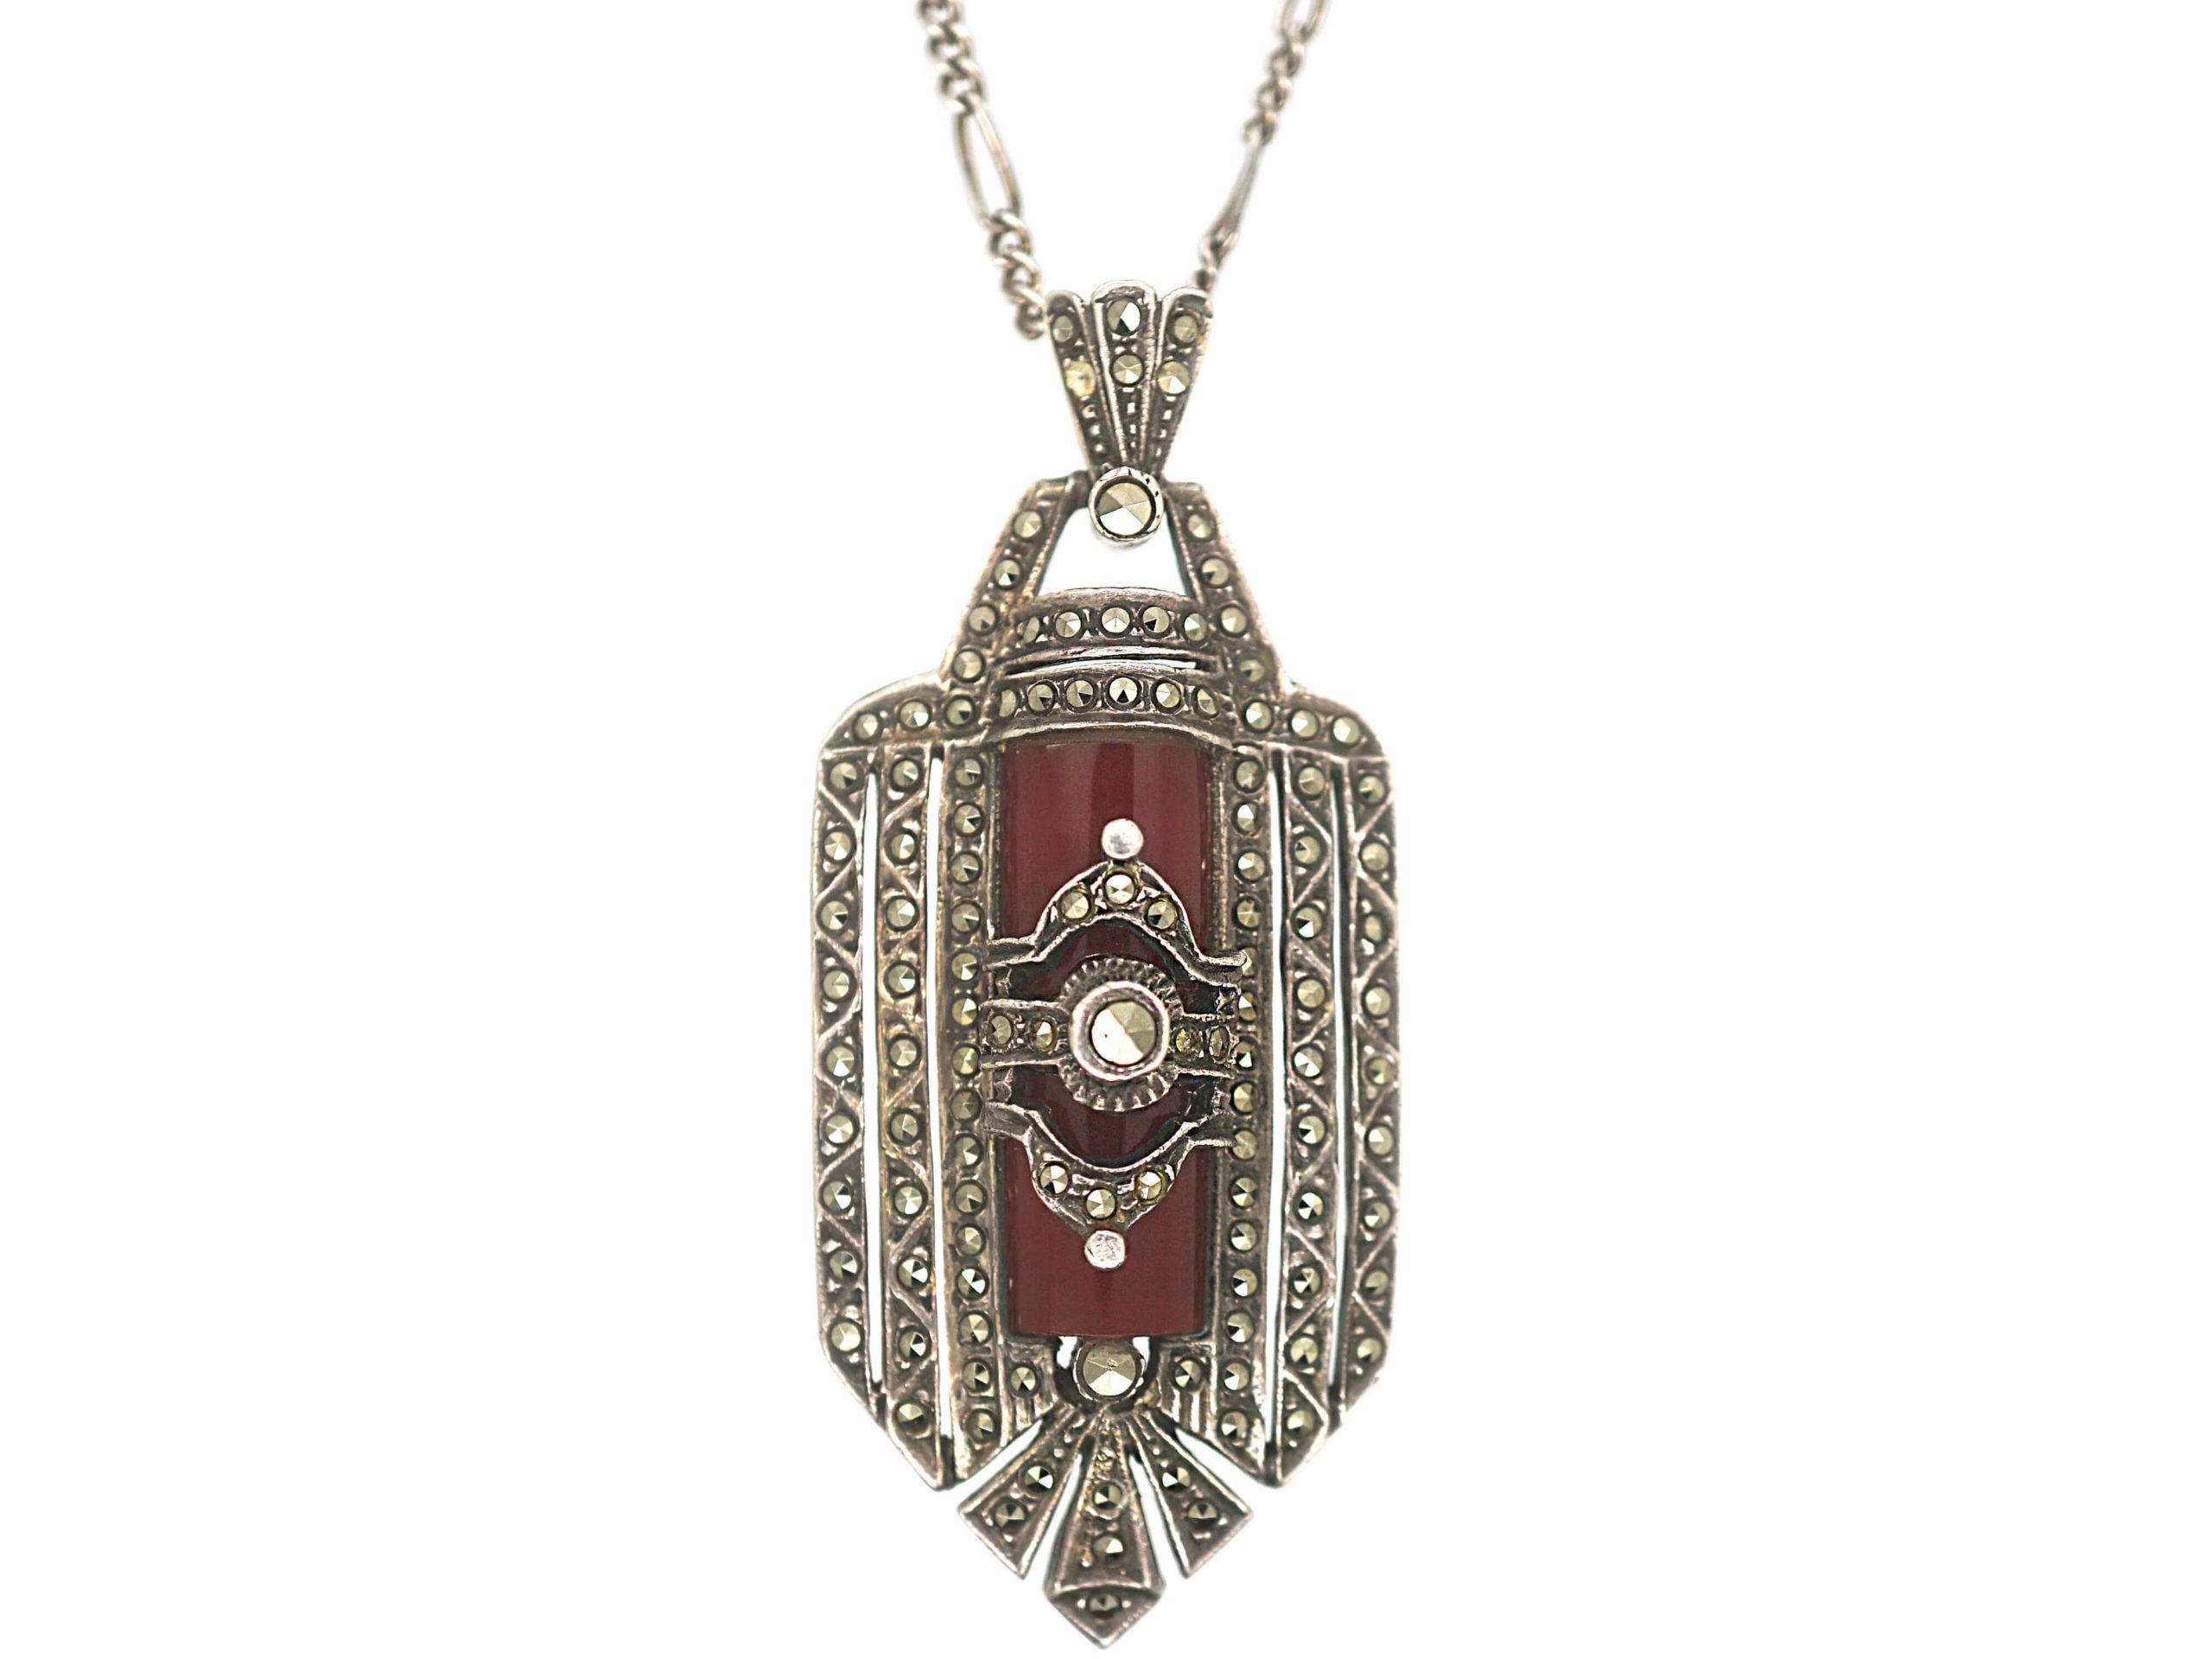 Art Deco Silver, Carnelian & Marcasite Pendant on Silver Chain